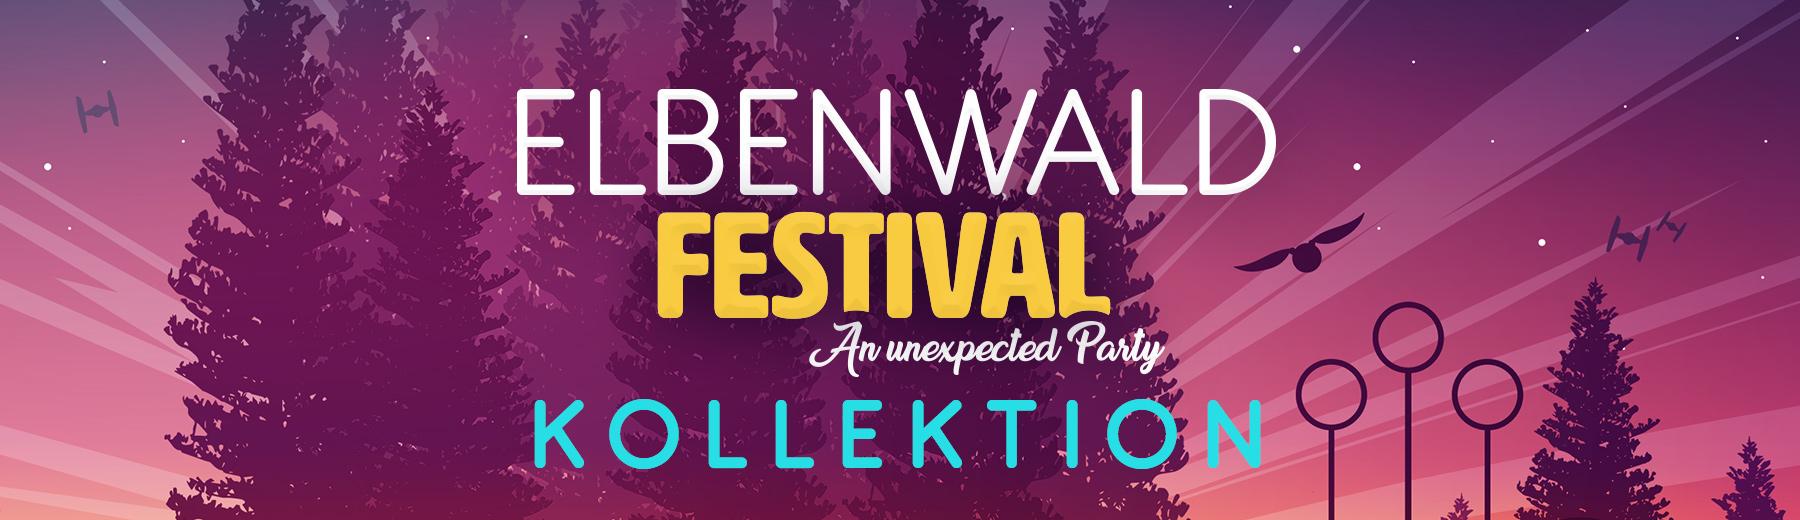 Festival Kollektion